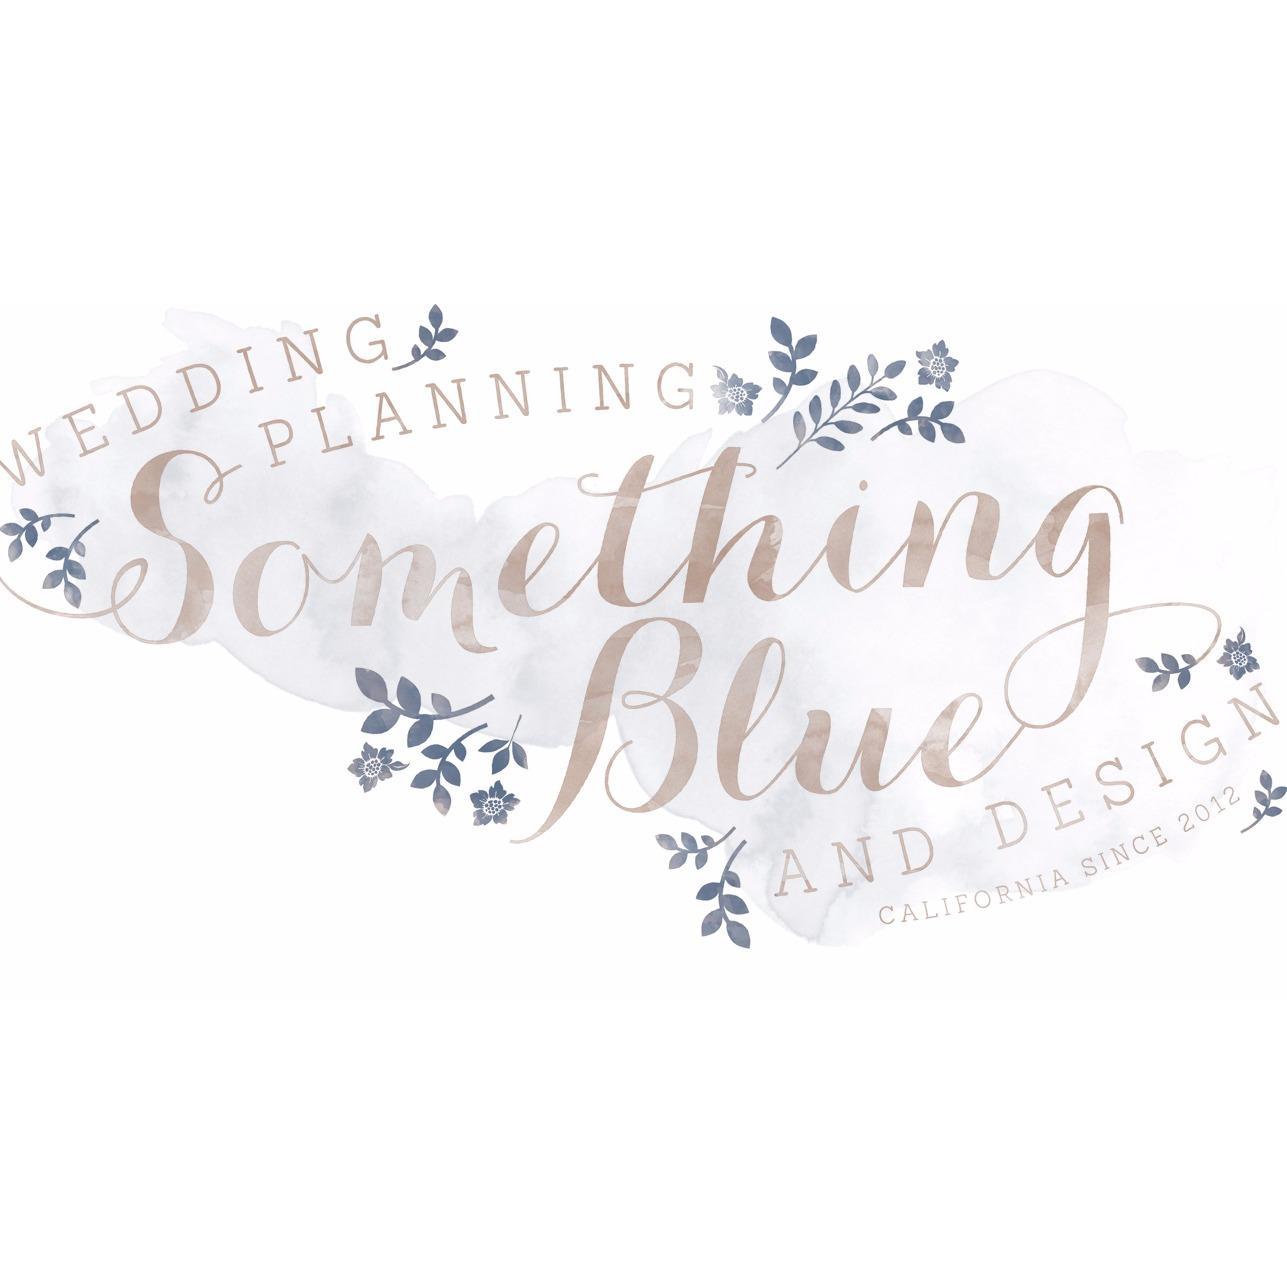 Something Blue Wedding Planning & Design